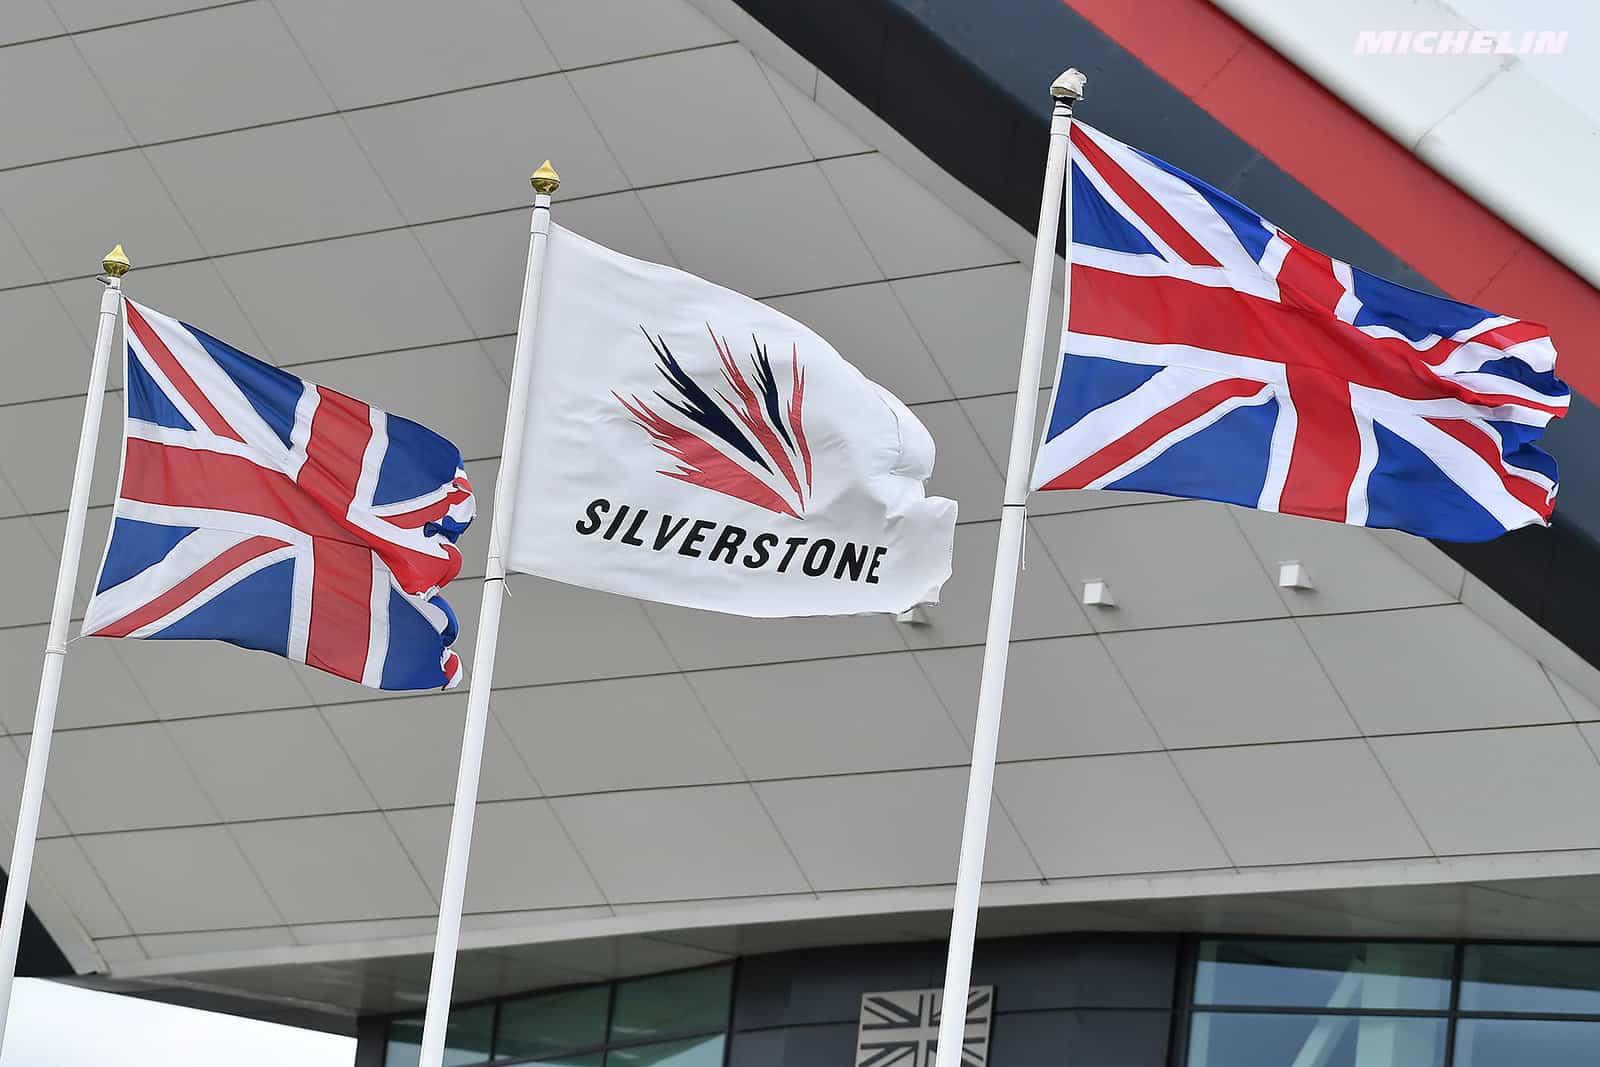 MotoGP 2020年のイギリスGP、オーストラリアGPの中止が決定